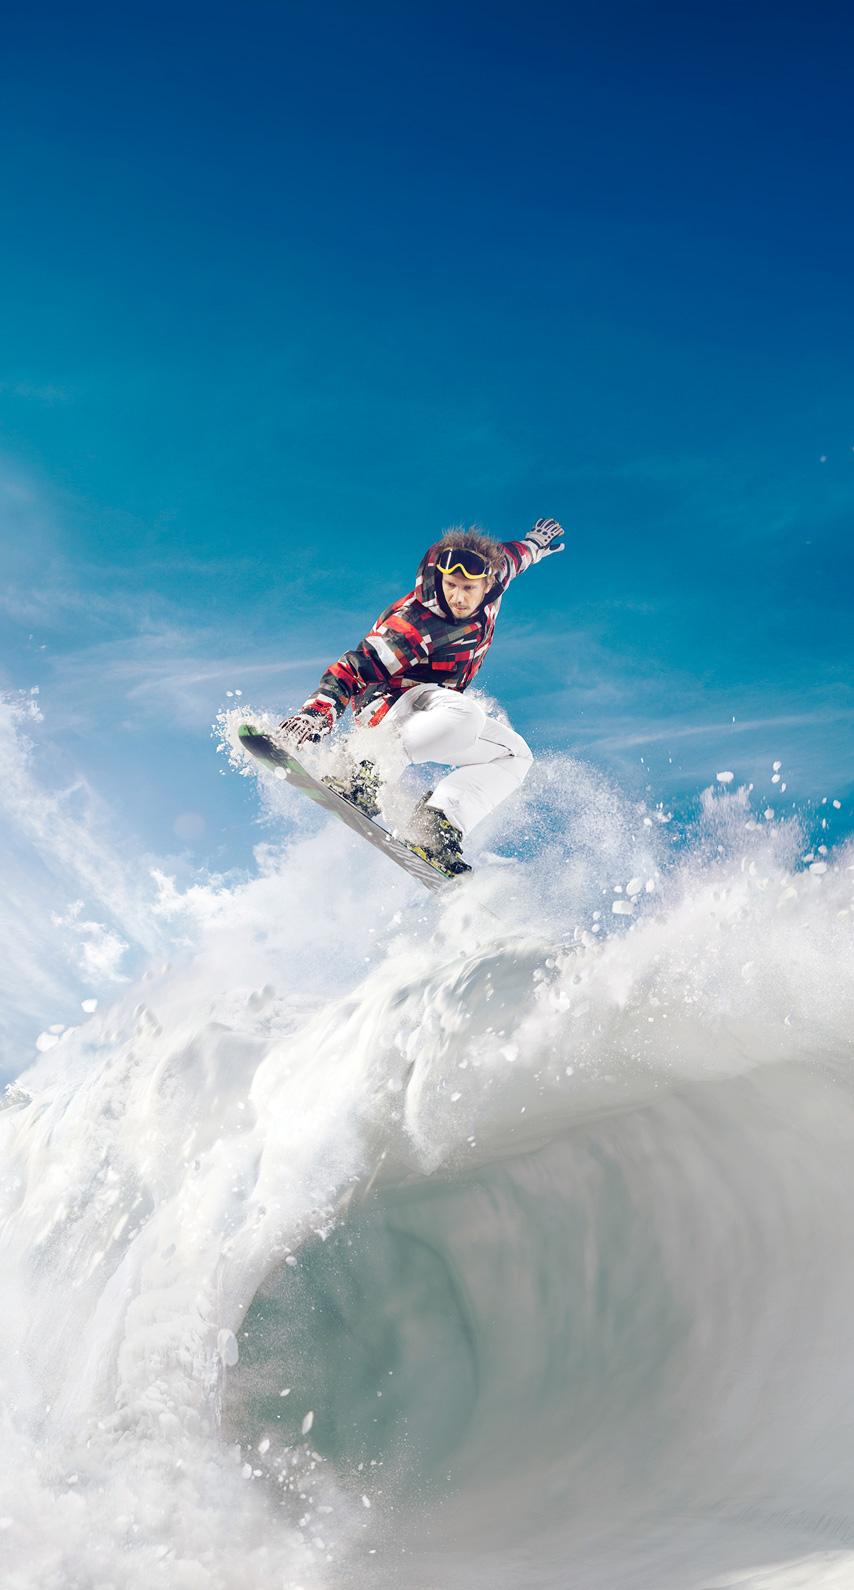 exhilaration, skier